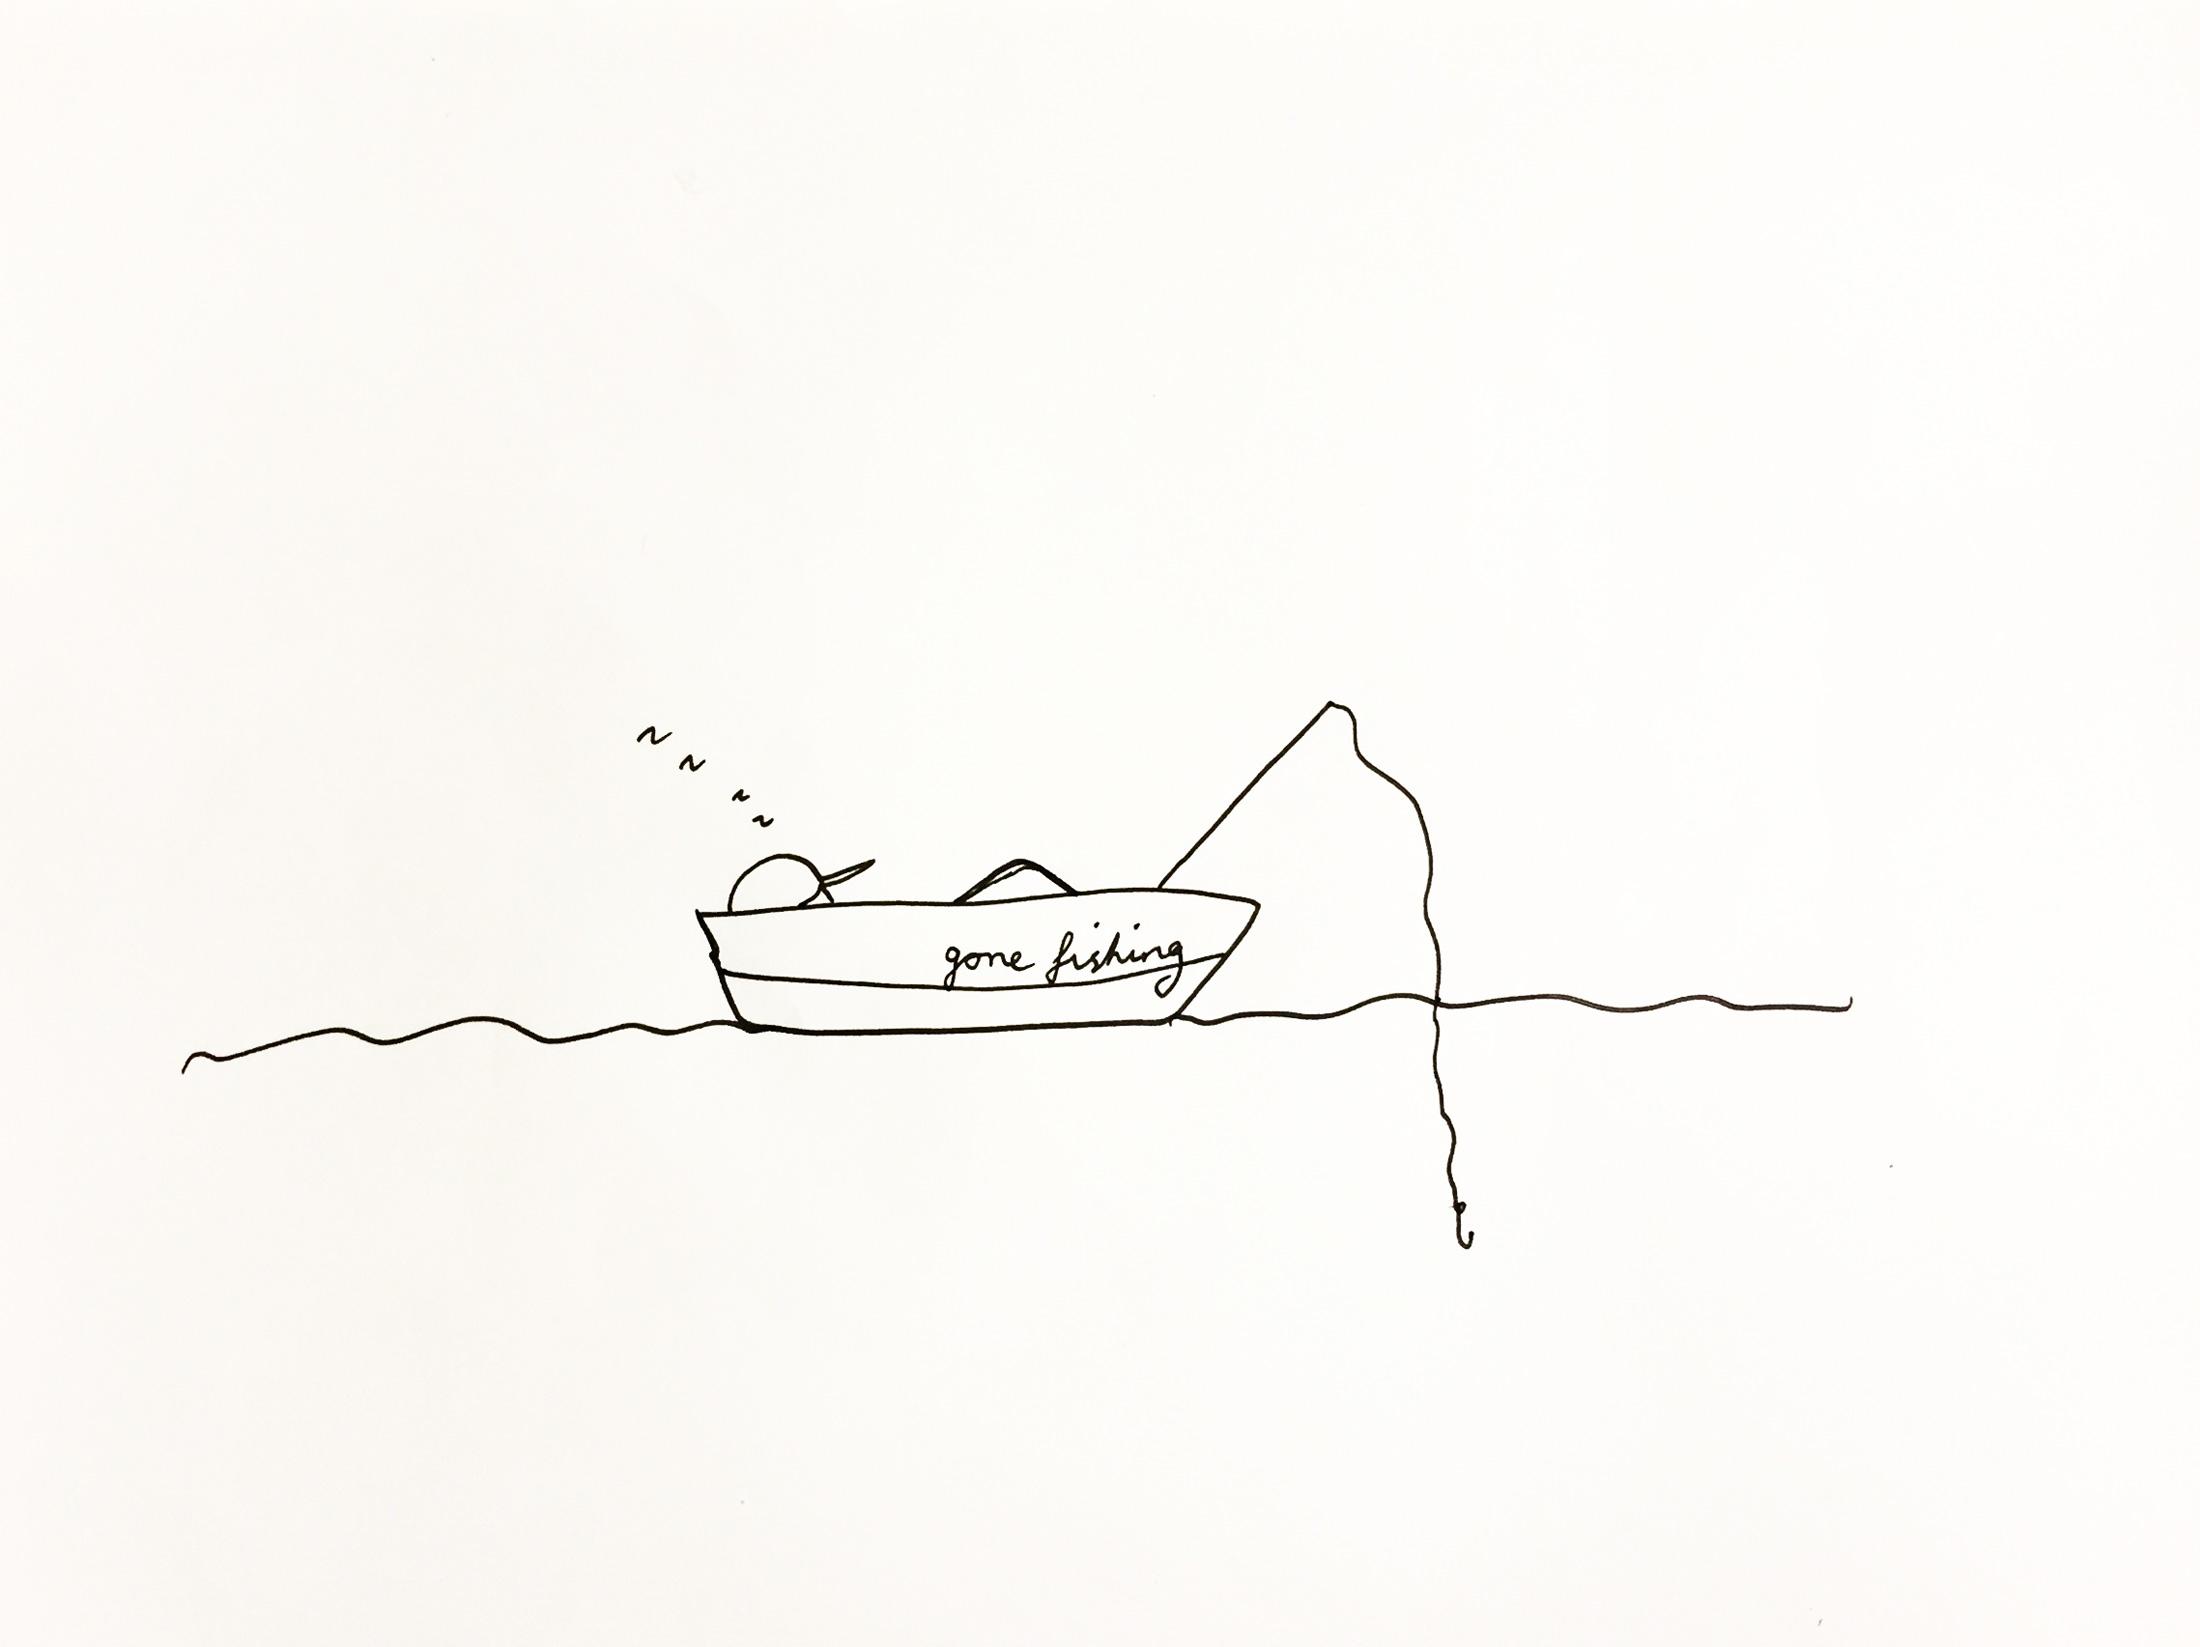 Gone fishing. Drawing Luke Hockley.